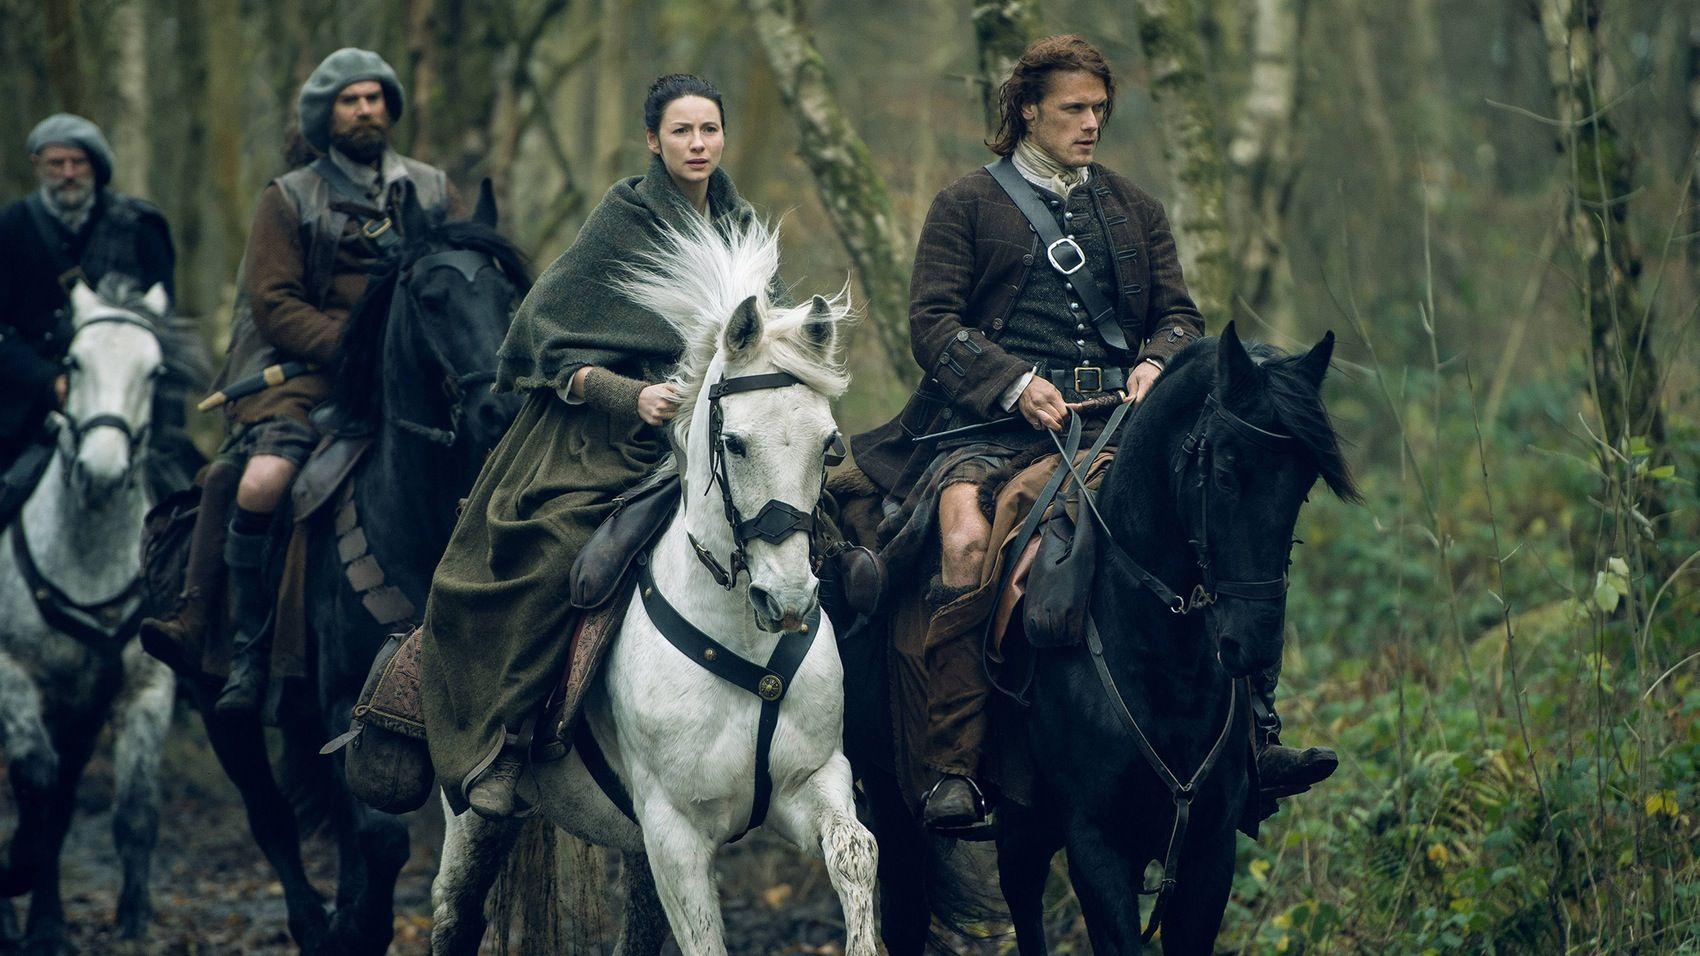 Outlander Outlander Costumes Outlander Season 2 Outlander